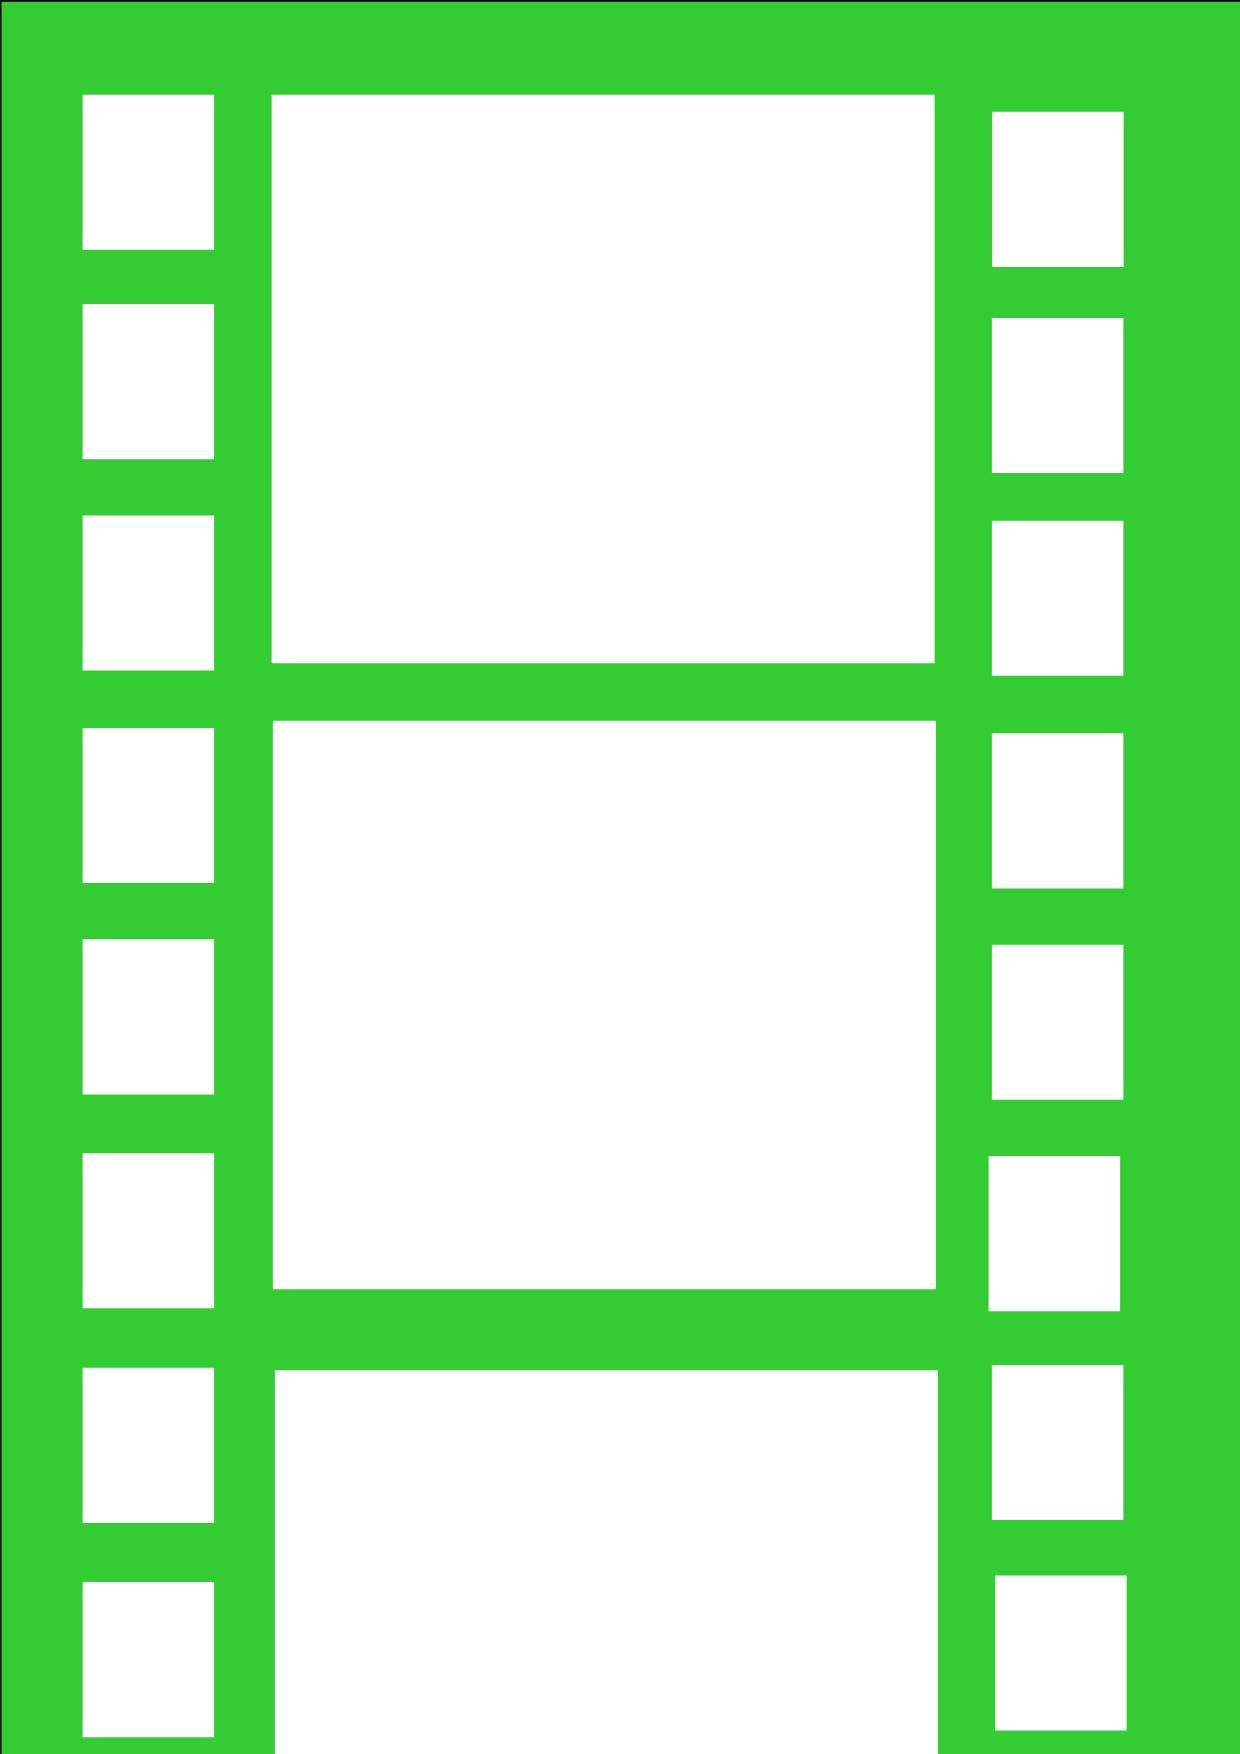 picto videos